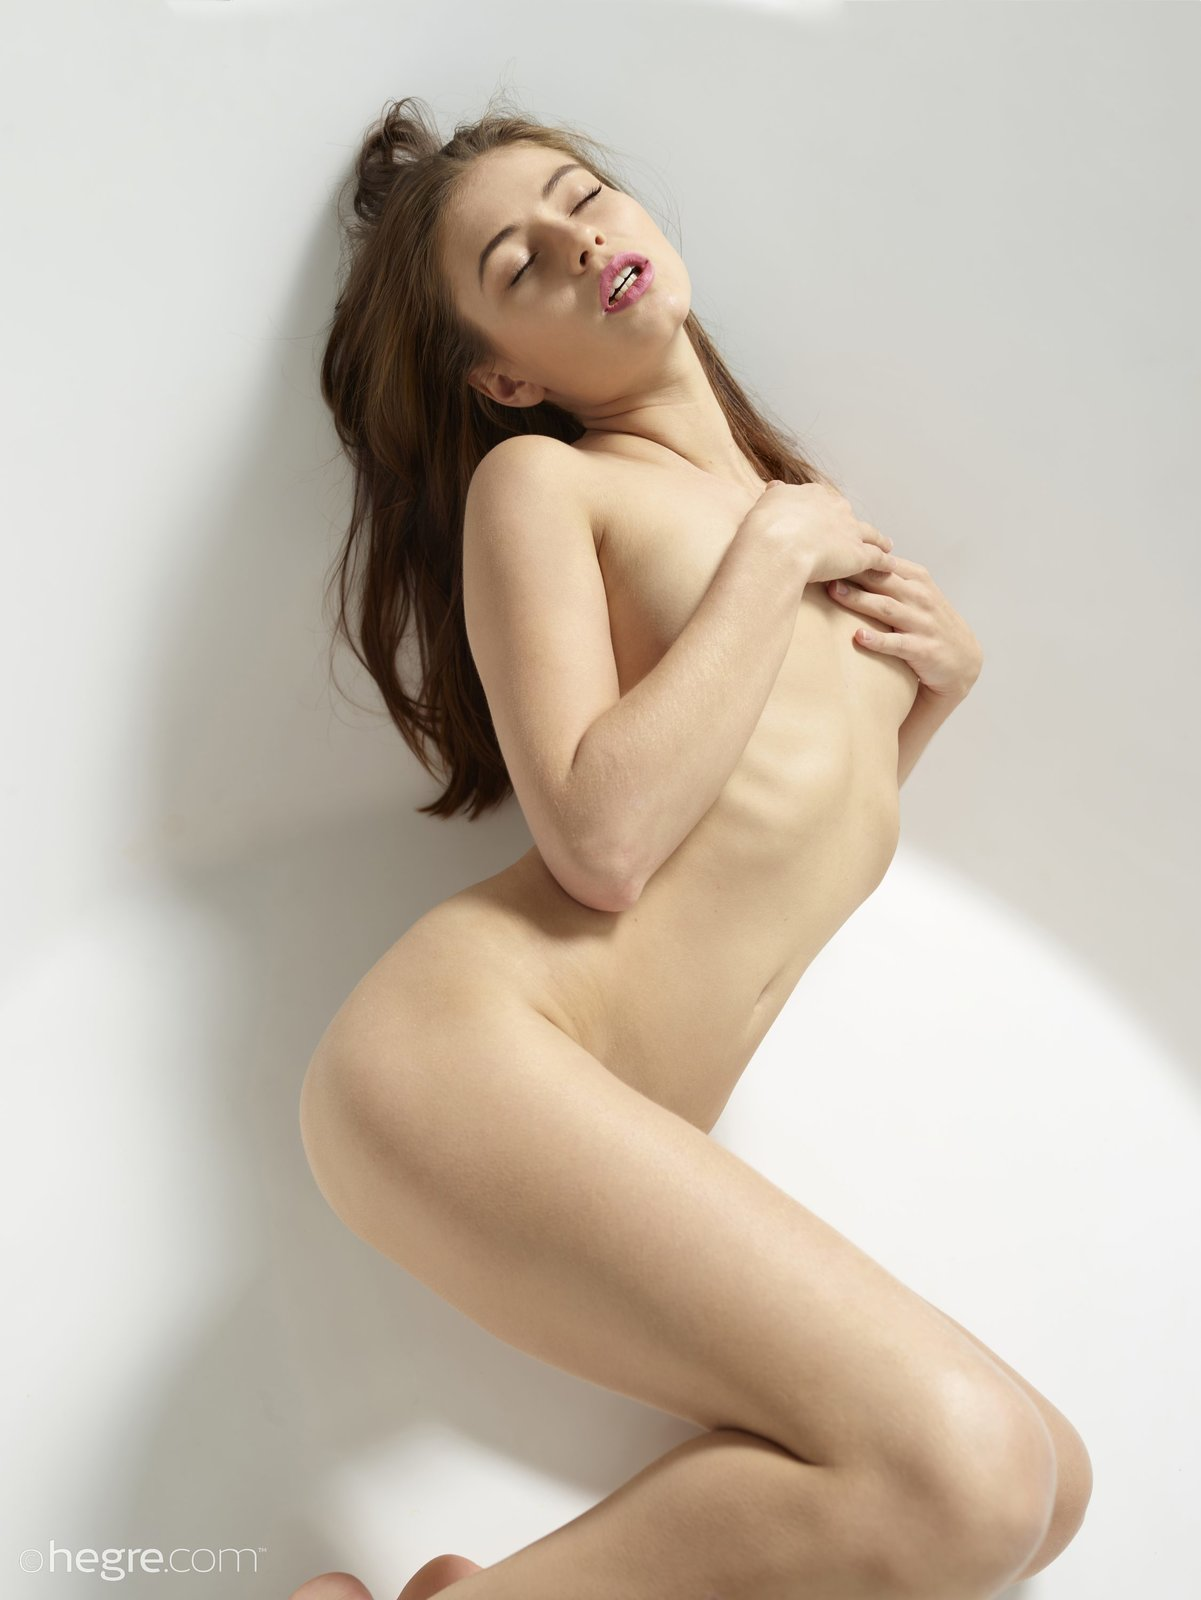 Naked pussy galore, muscularnudegirls